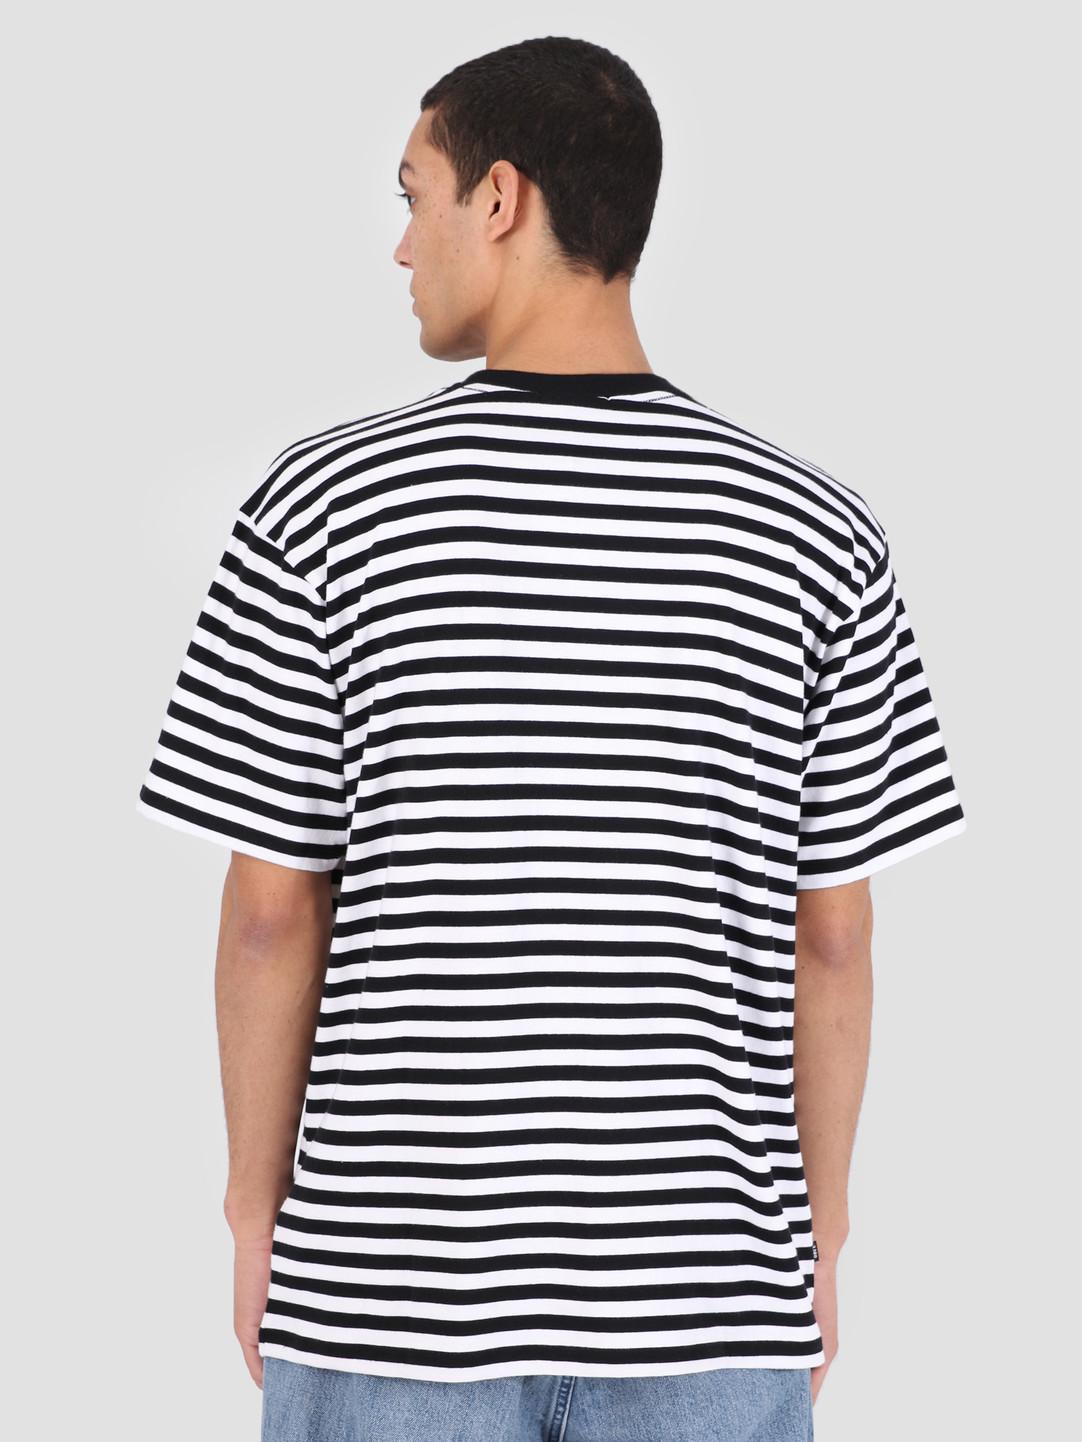 Obey Obey 89 Icon Stripe Box T-Shirt II BKM 131080242